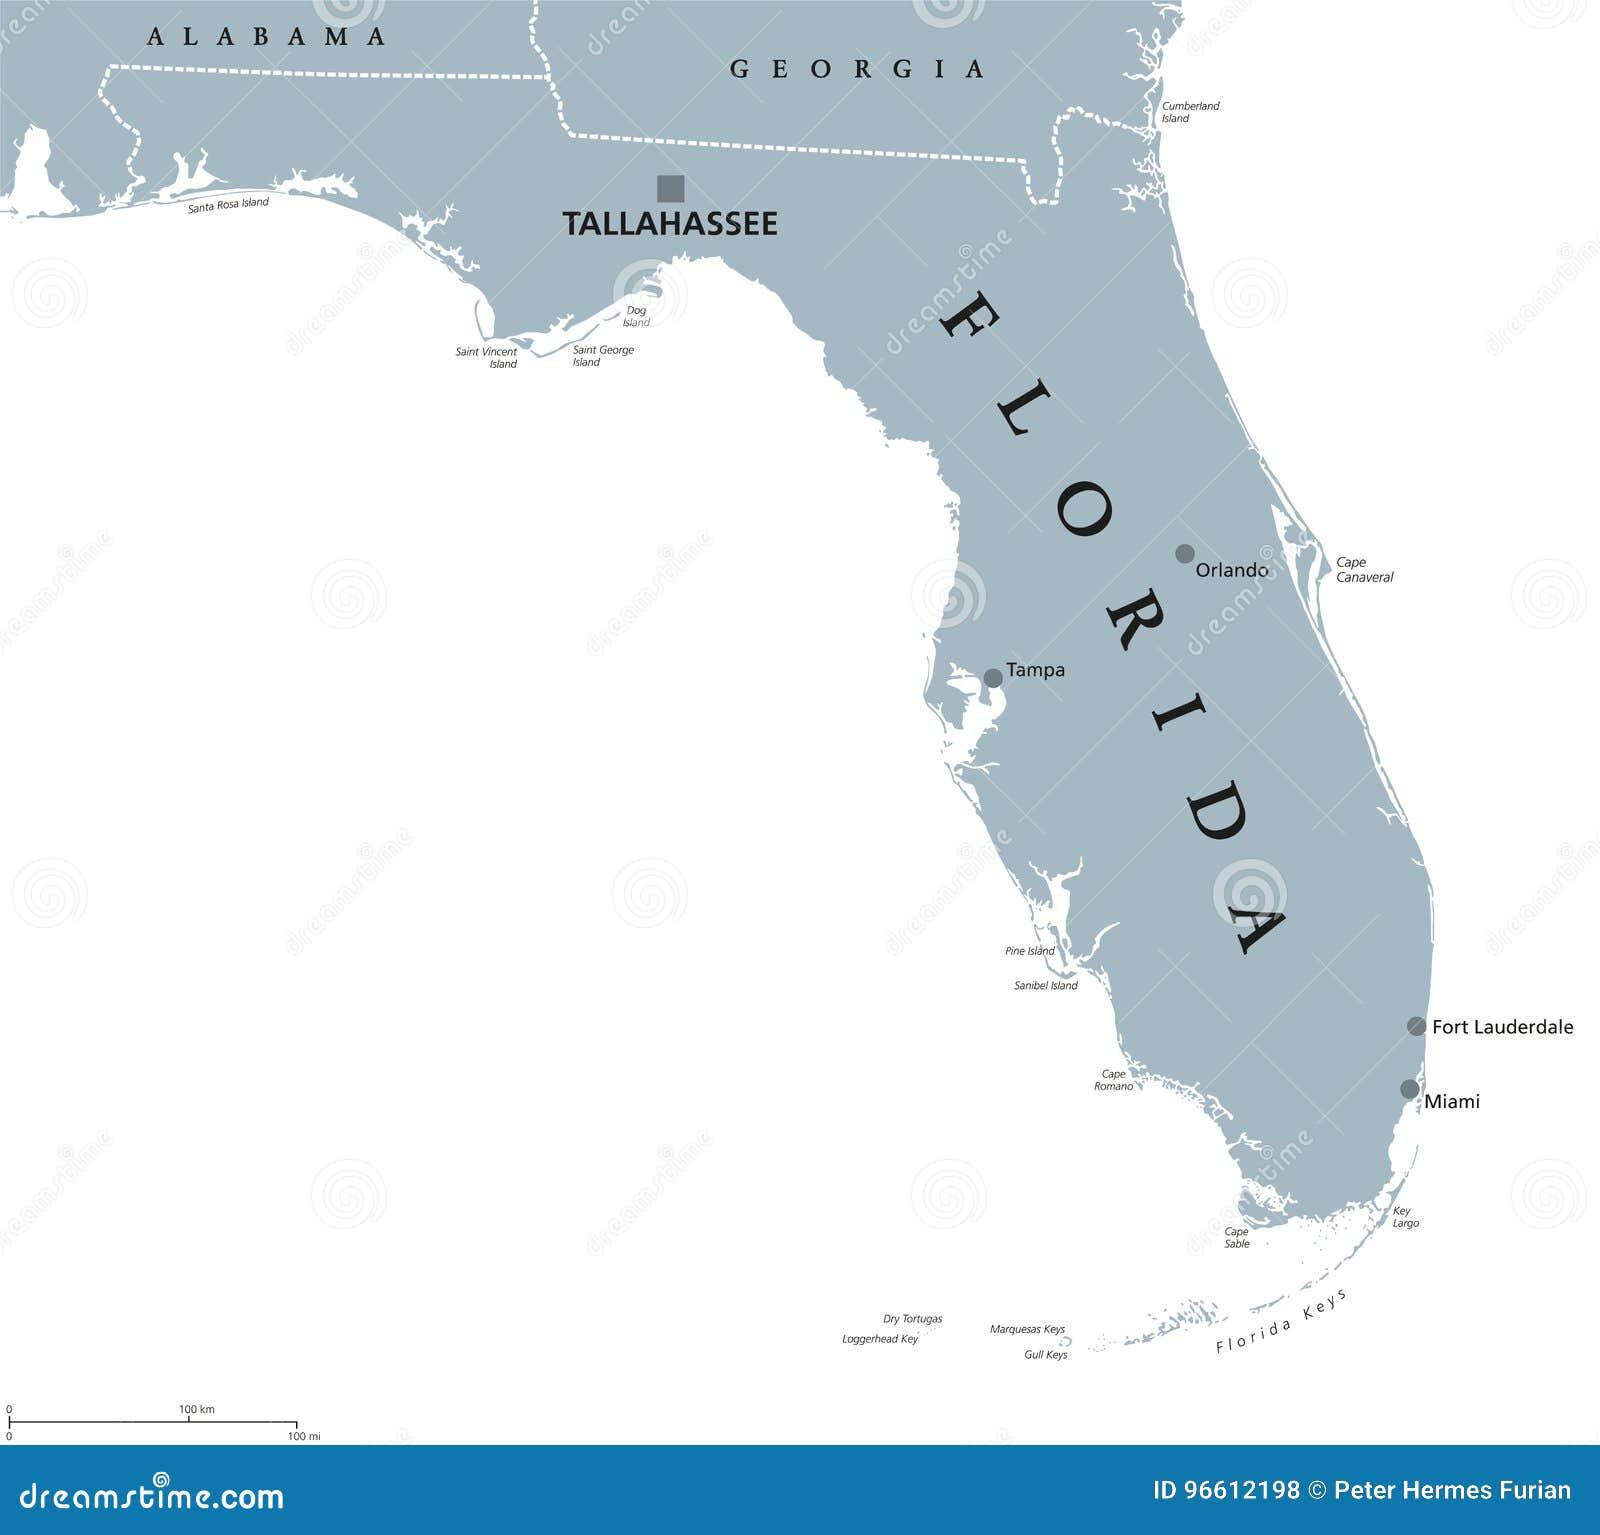 Dog Island Florida Map.Florida United States Political Map Stock Vector Illustration Of